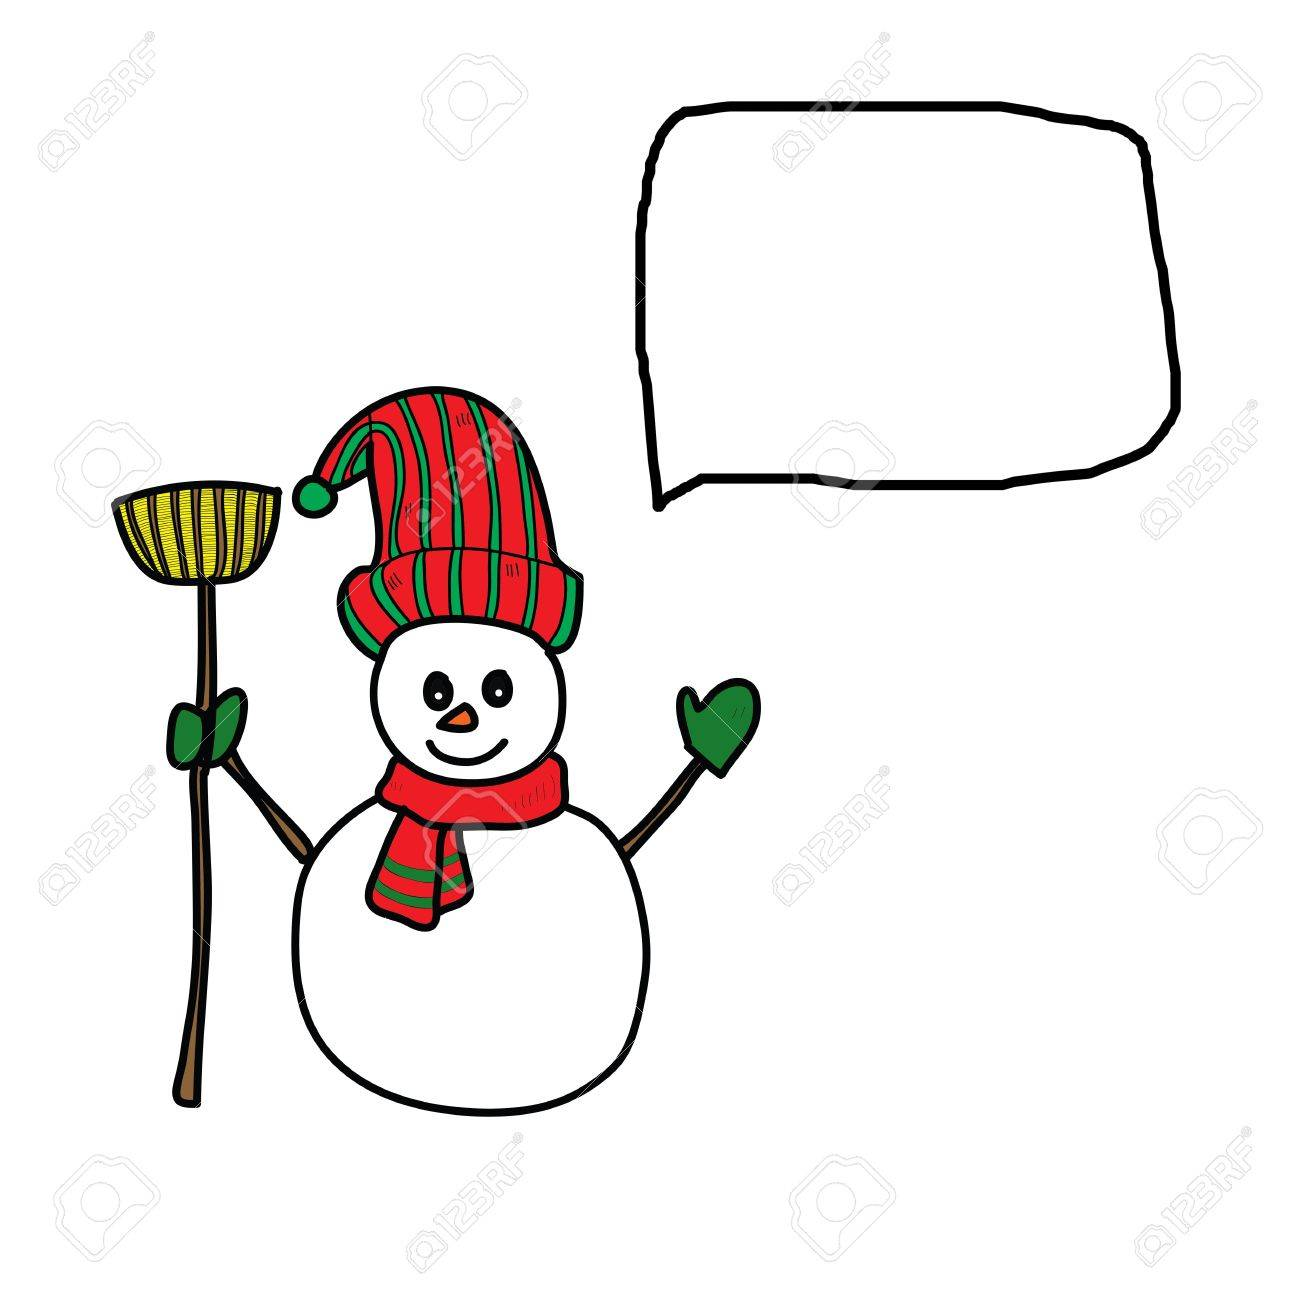 cartoon snowman hand drawn illustration Stock Vector - 16055600